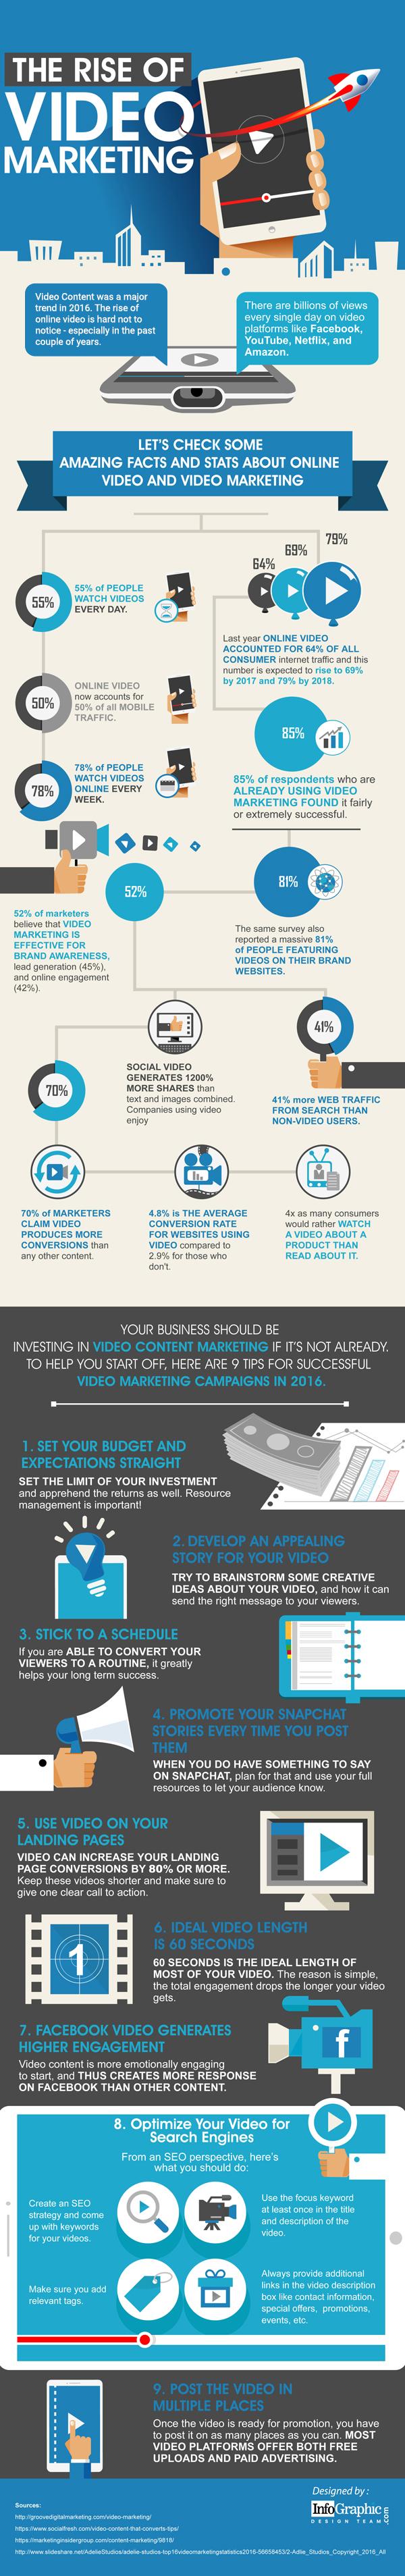 Rise-Video-marketing